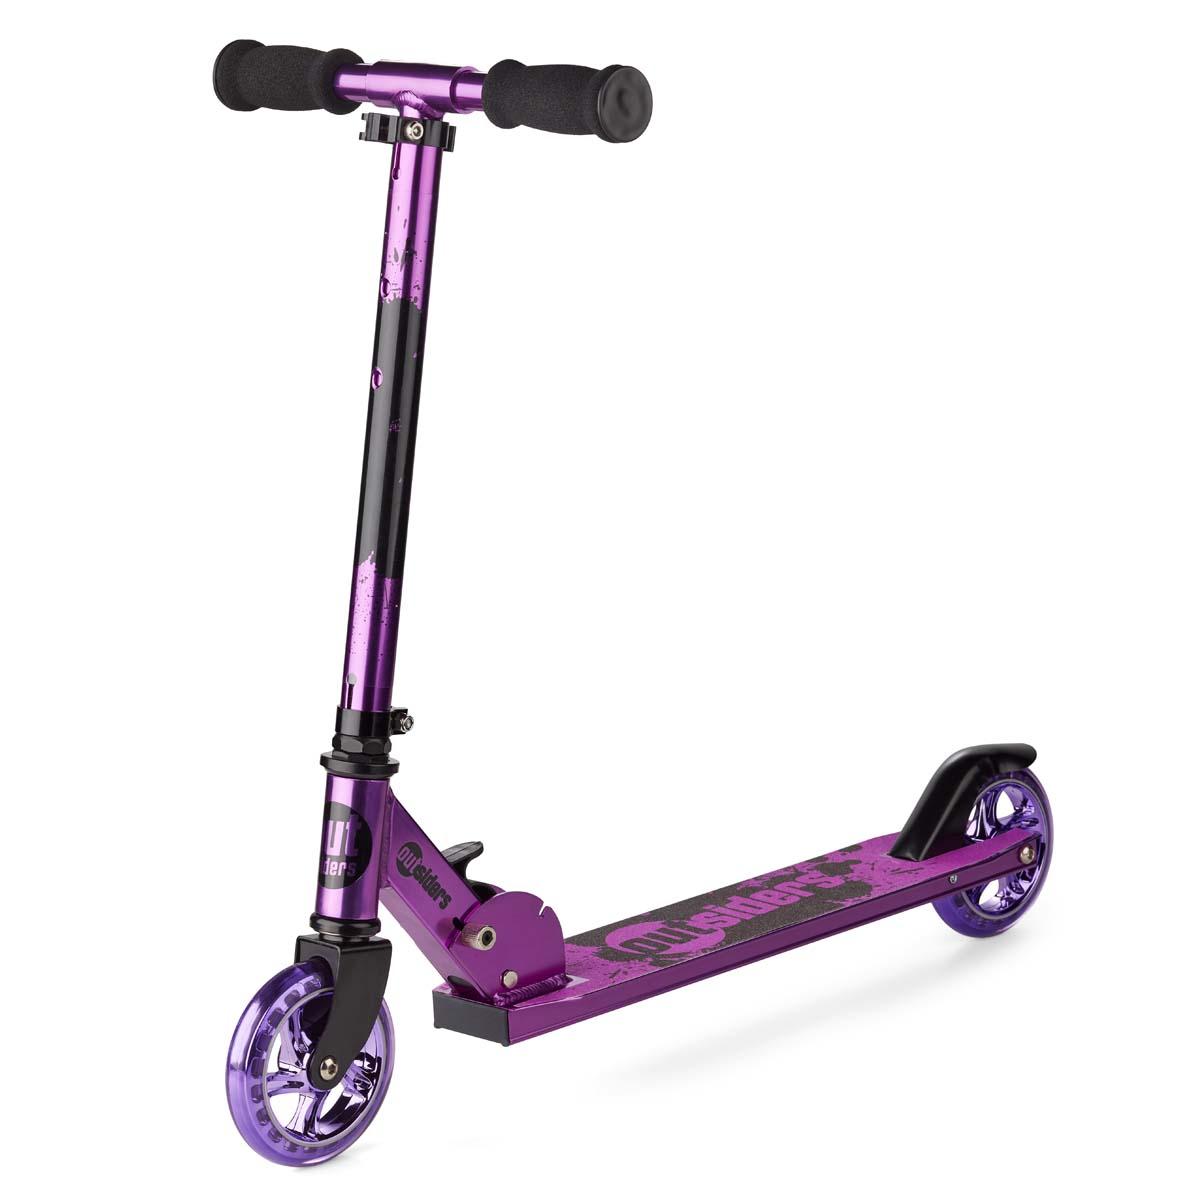 Outsiders - Premium Scooter Chrome Purple